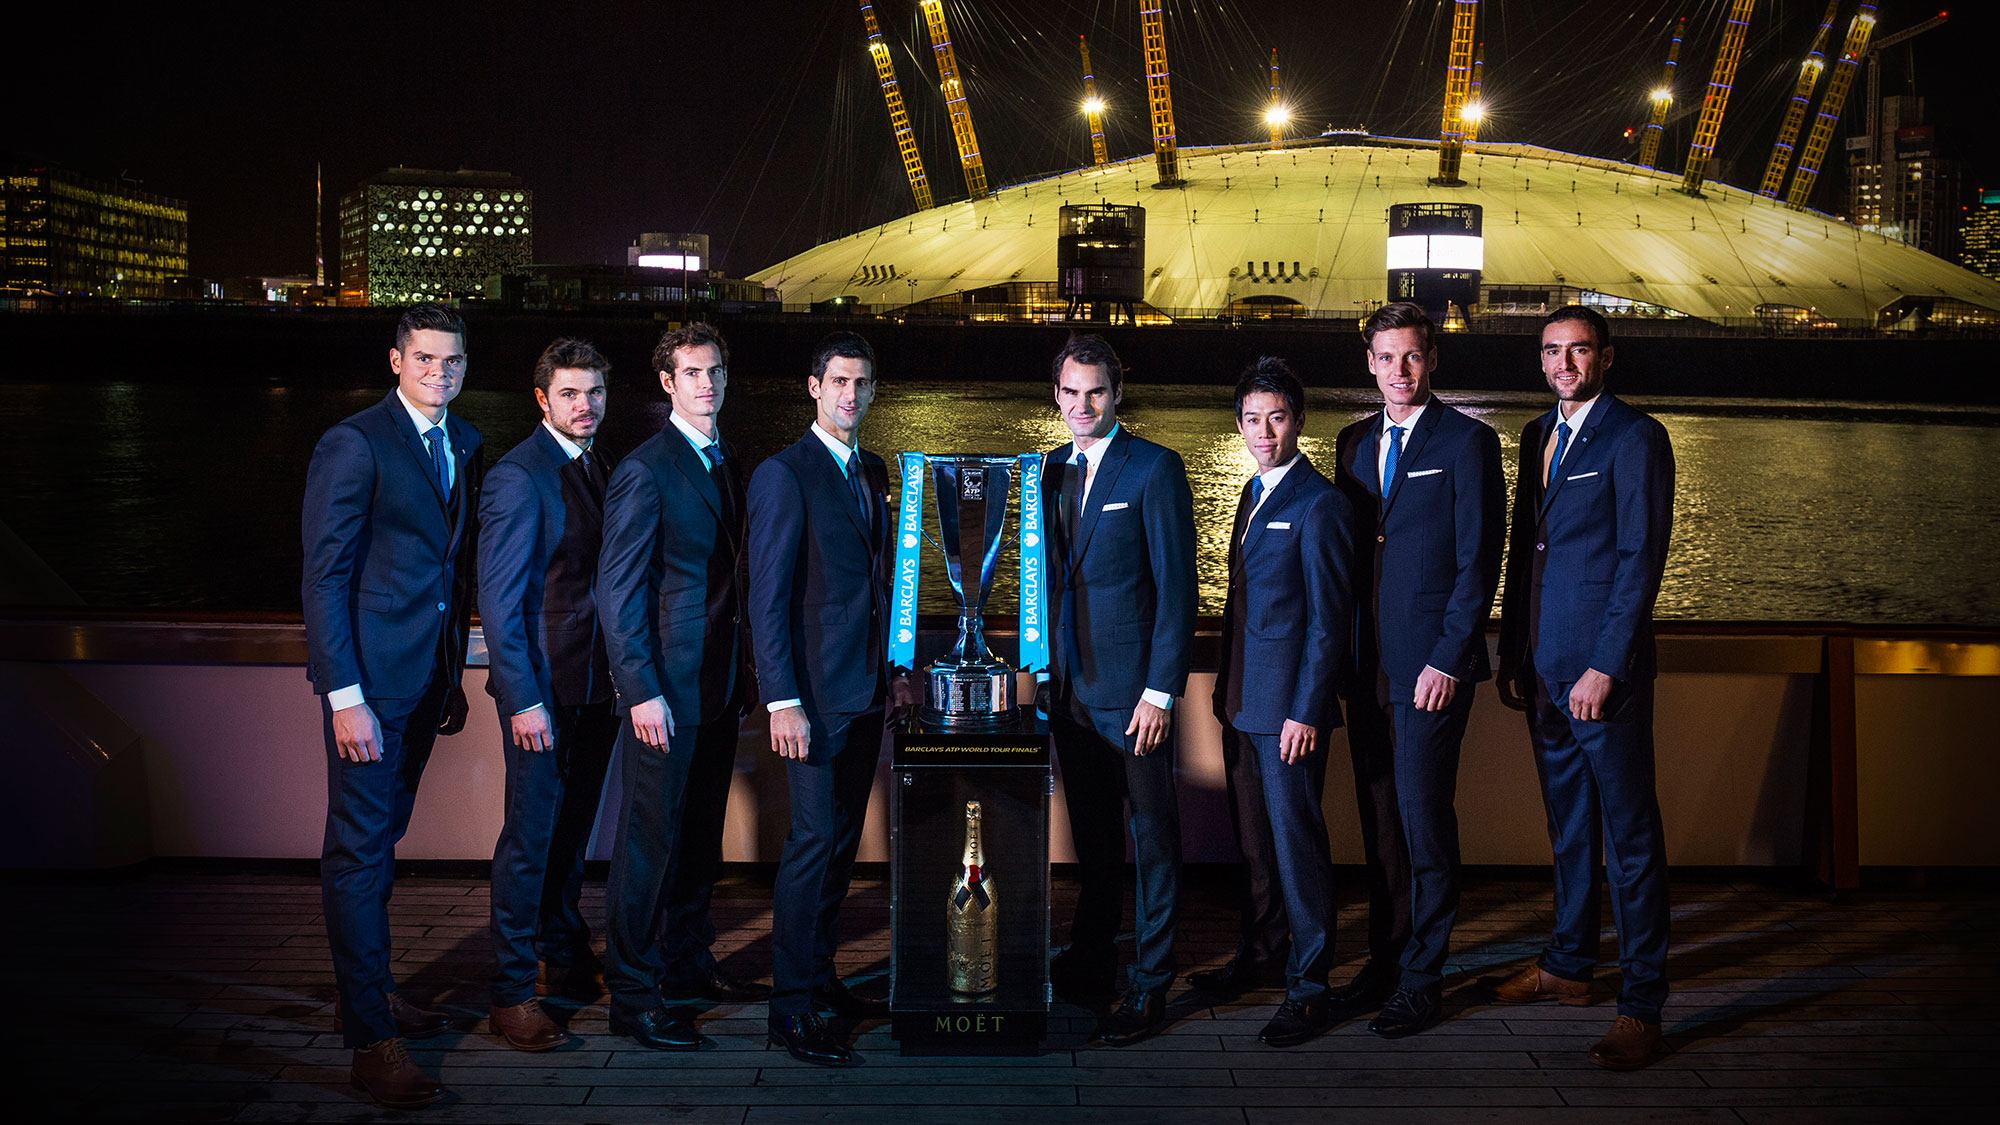 london-finale-2014-launch-trophy-2000